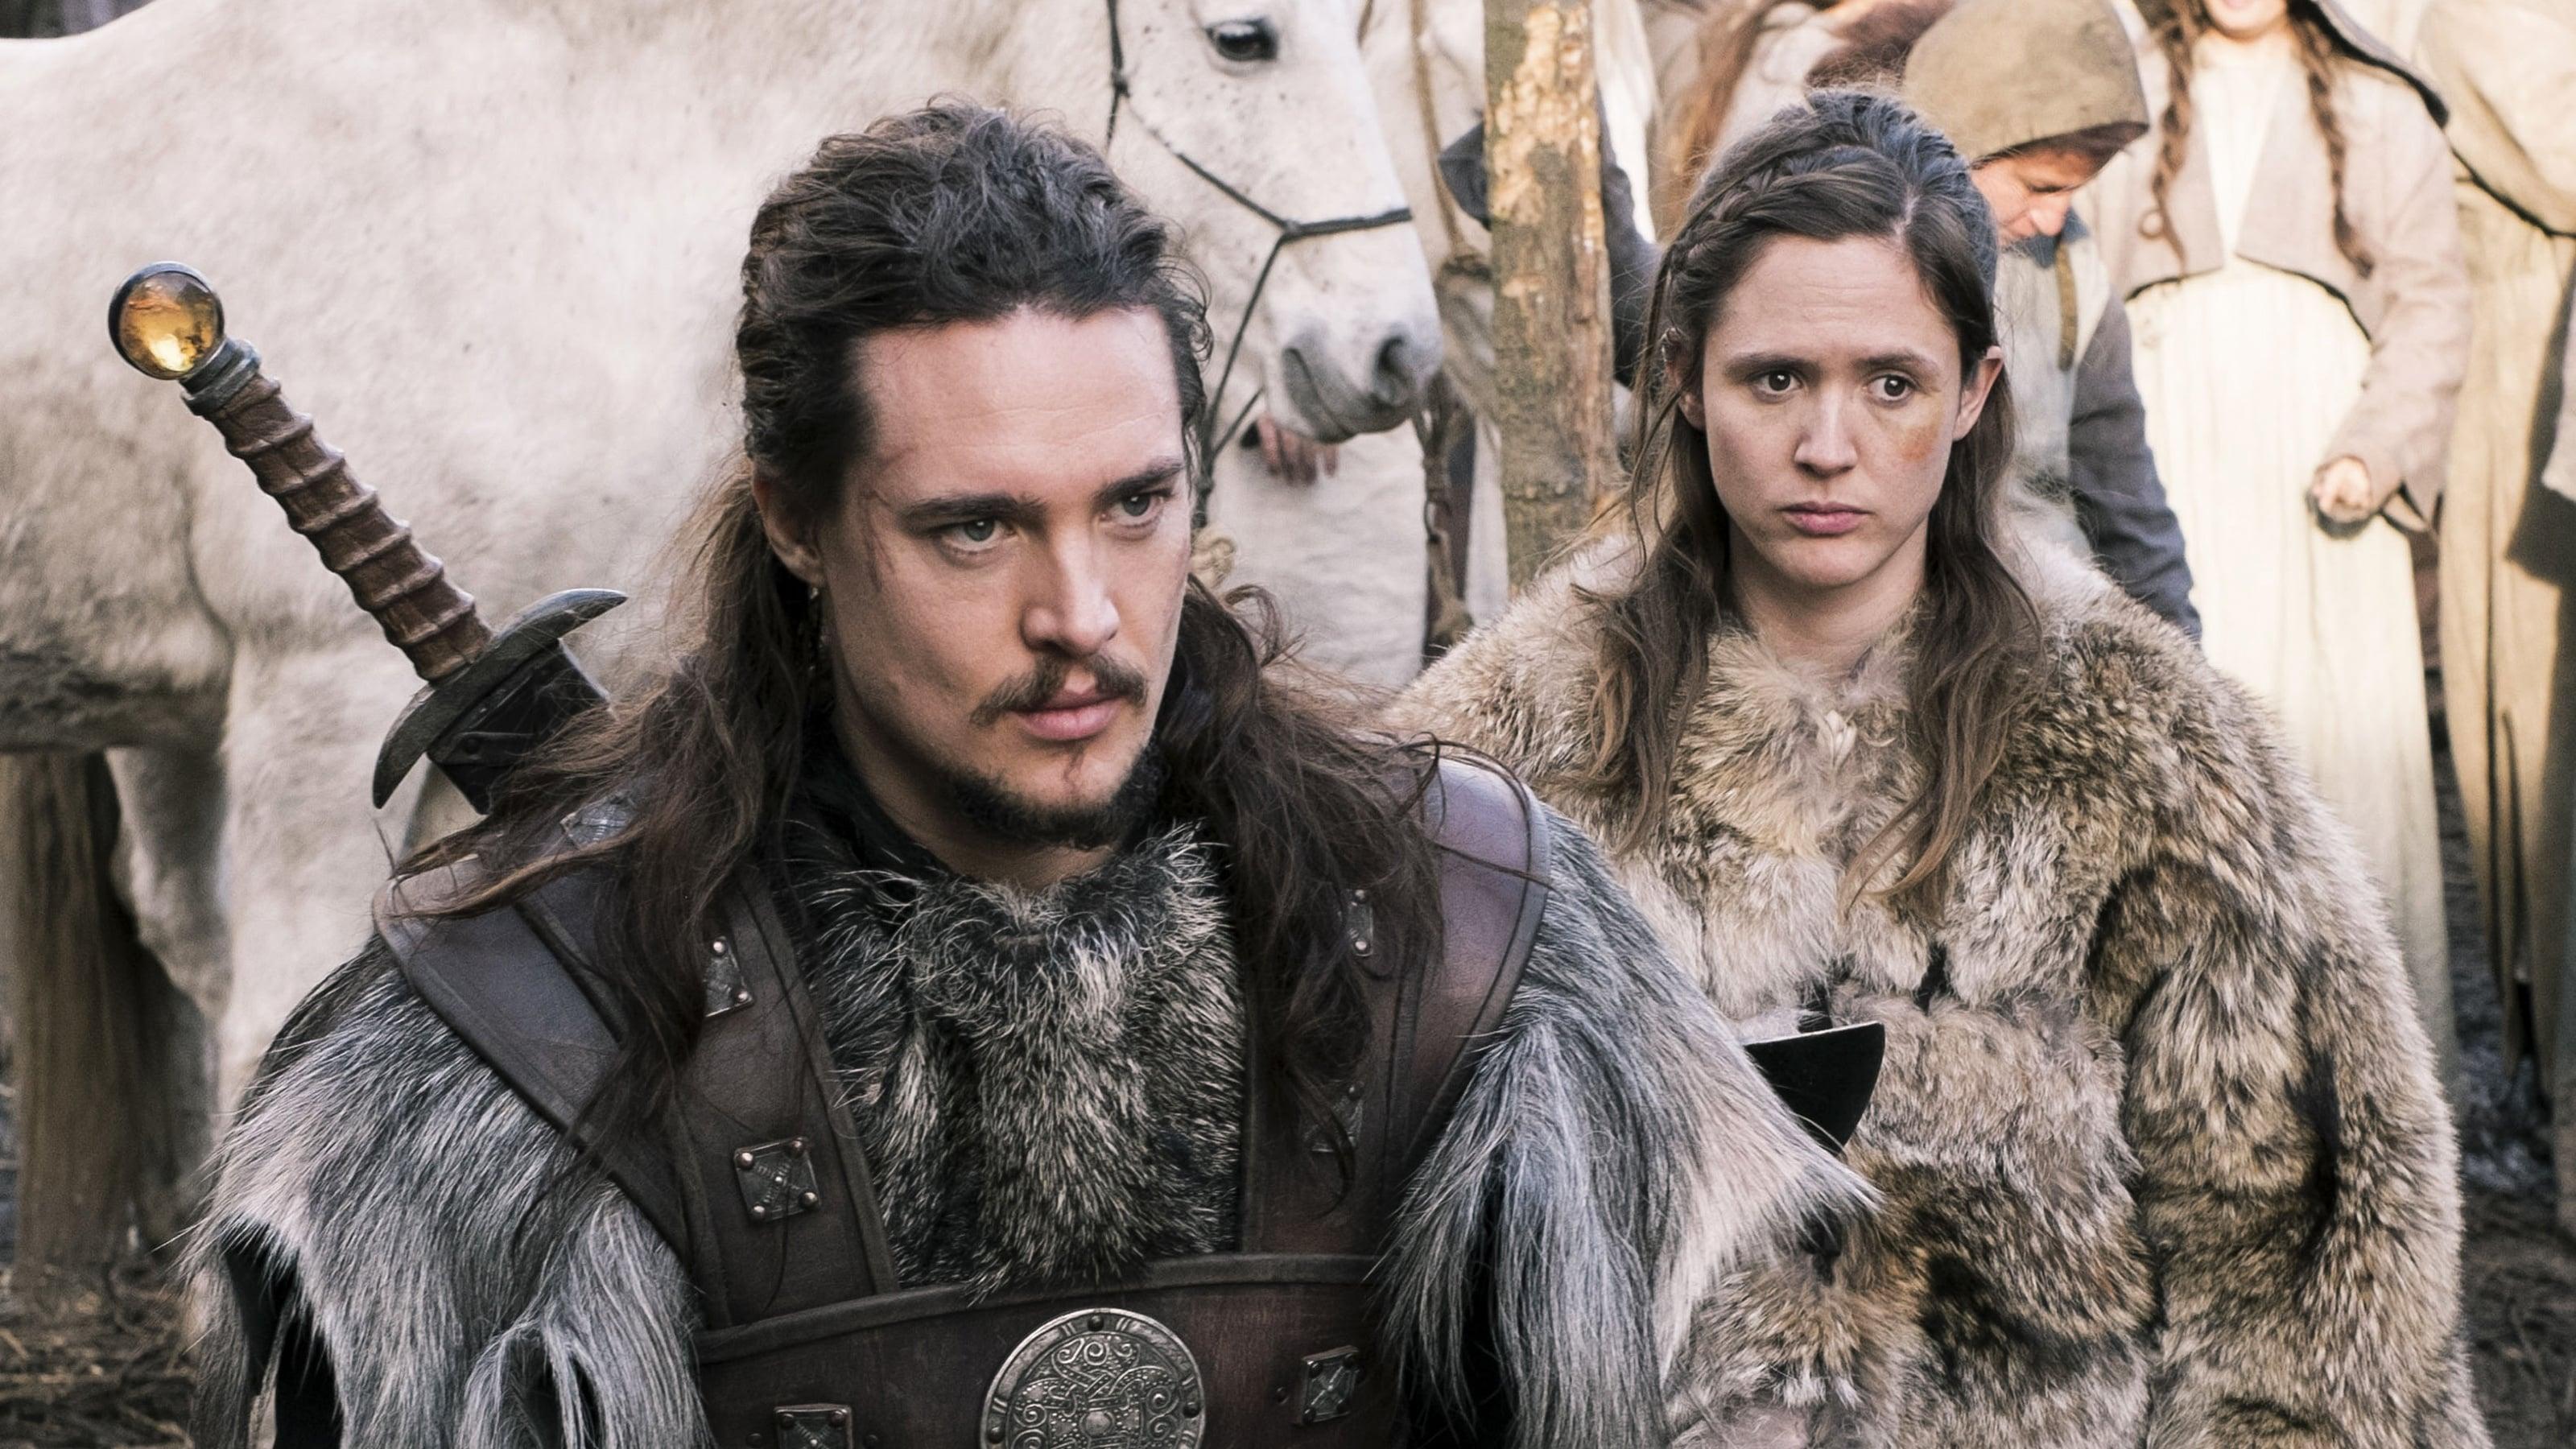 The Last Kingdom: Season 1 Episode 2 S01E02 Openload Watch